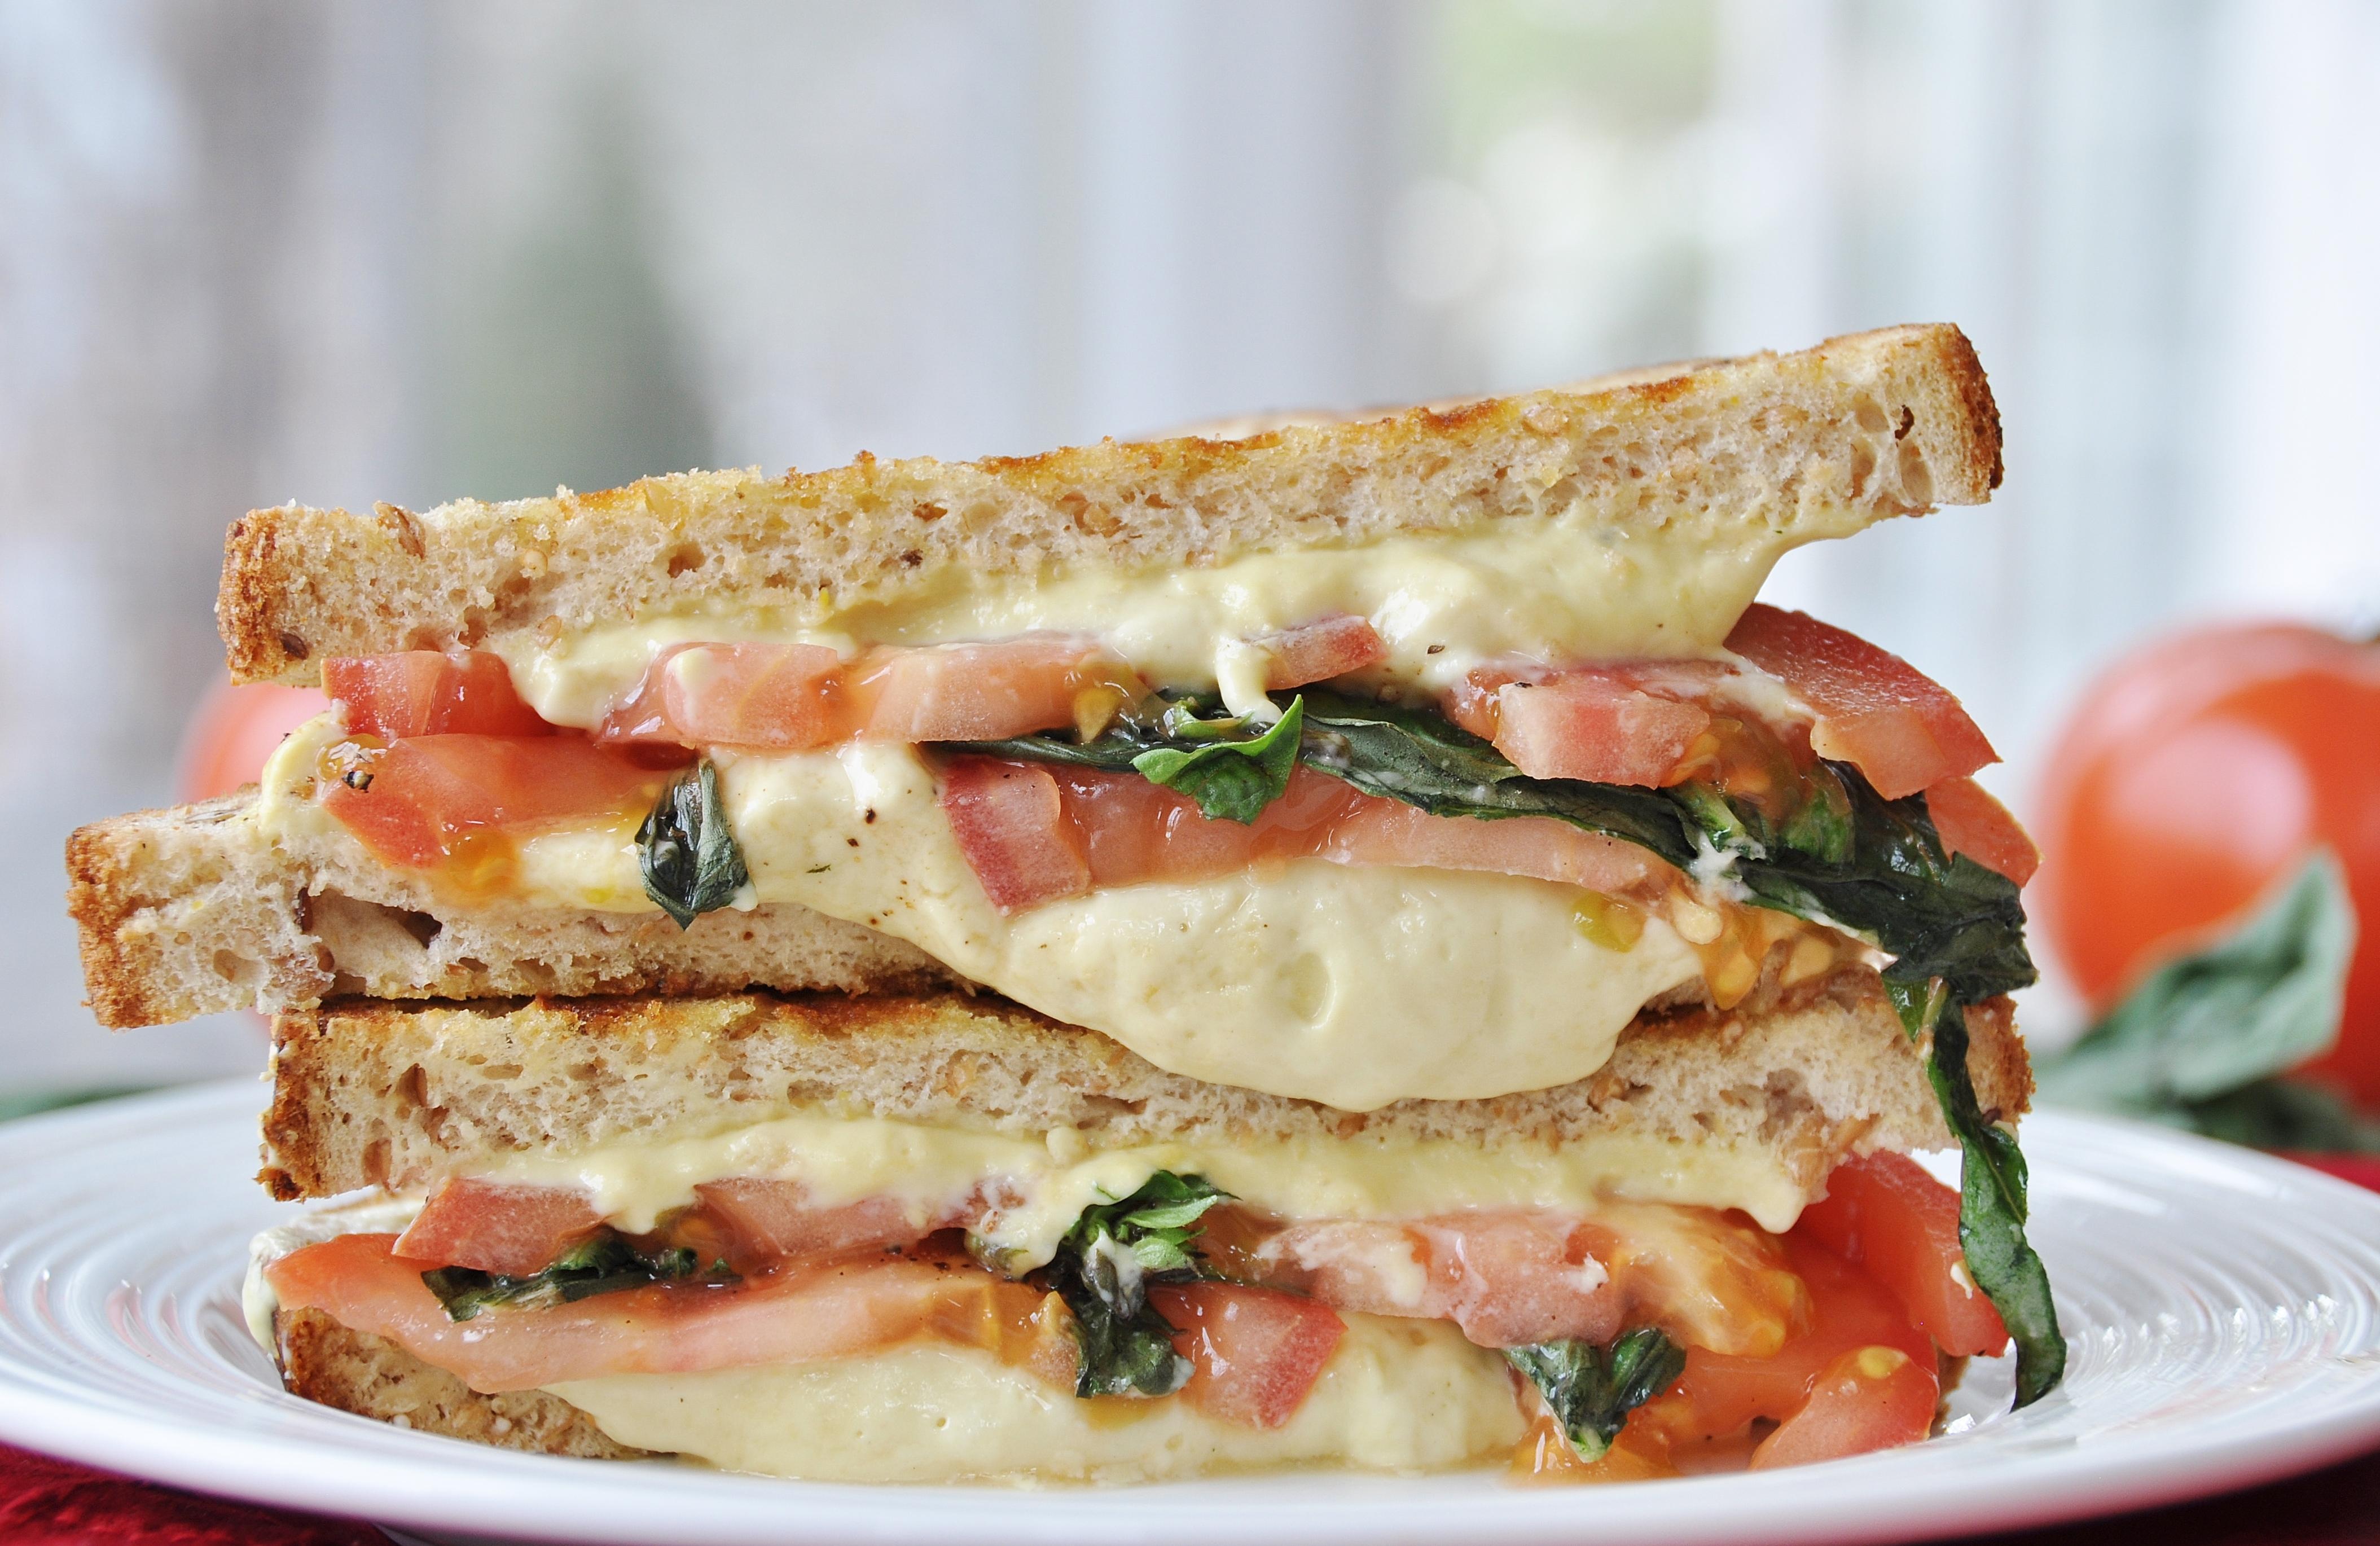 Vegan Tomato Basil Grilled Cheese Sandwich - Veganosity